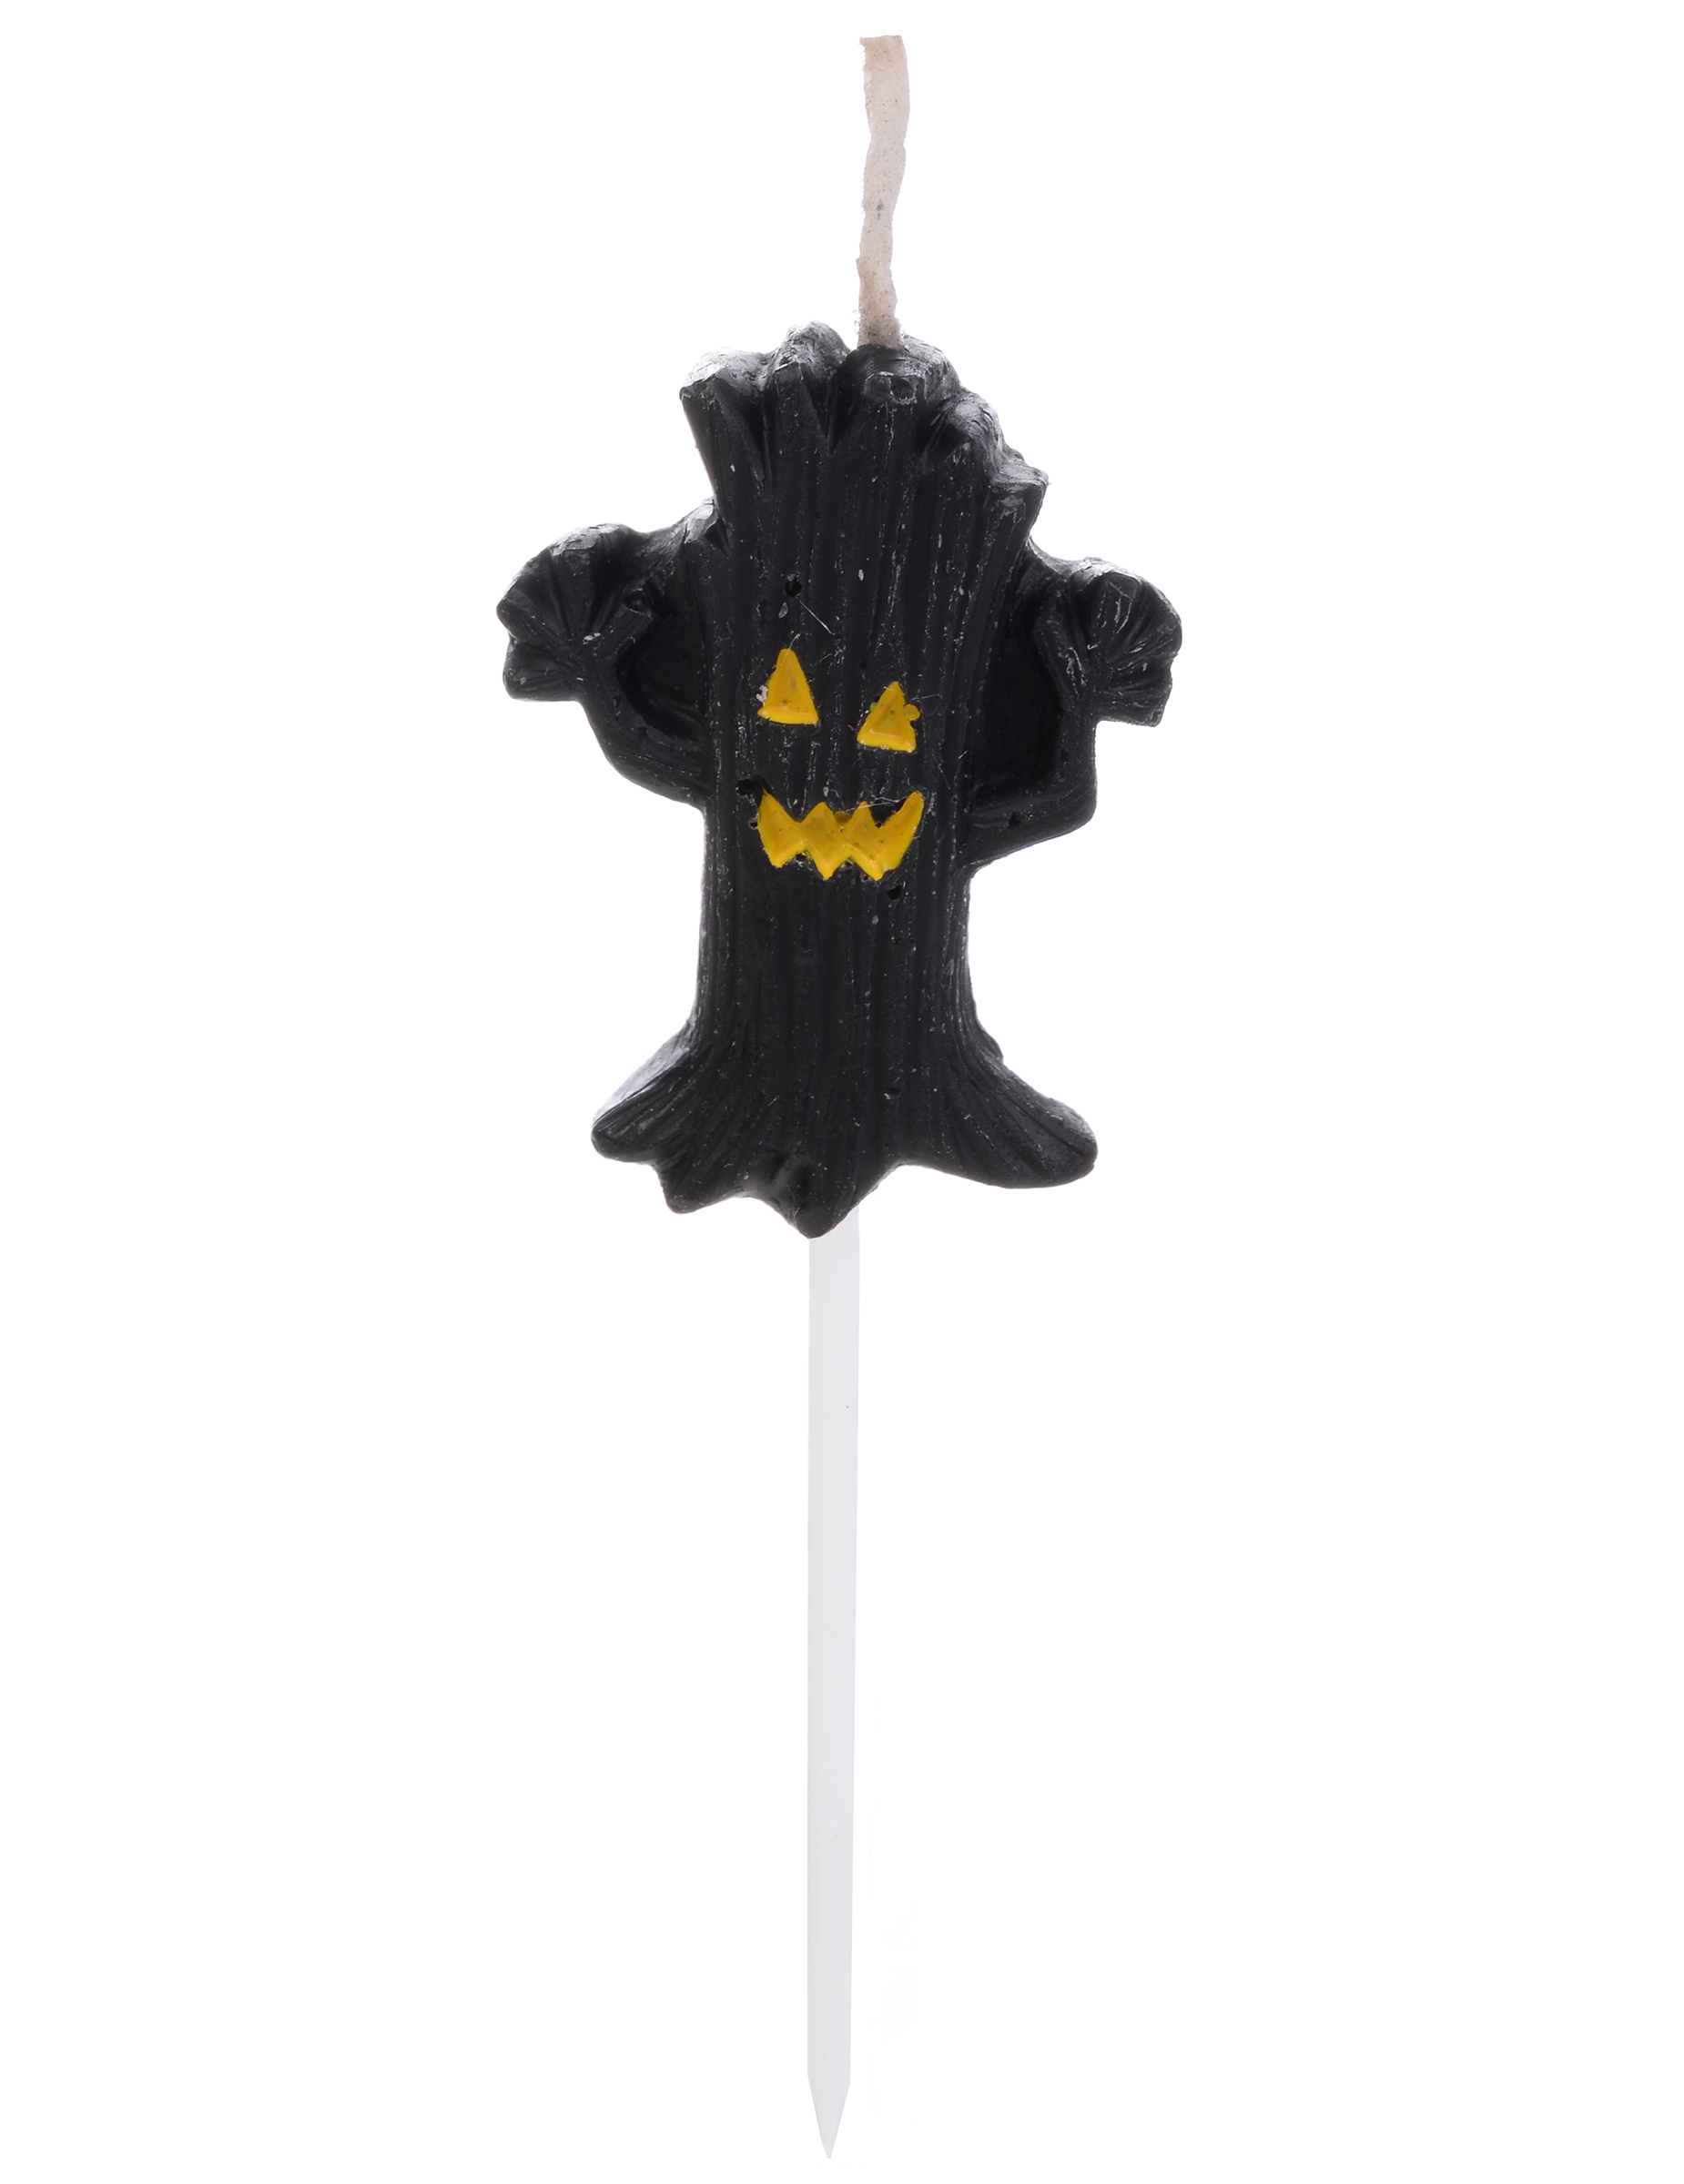 Decorazione Di Halloween 5 Candeline Mostruose Addobbi